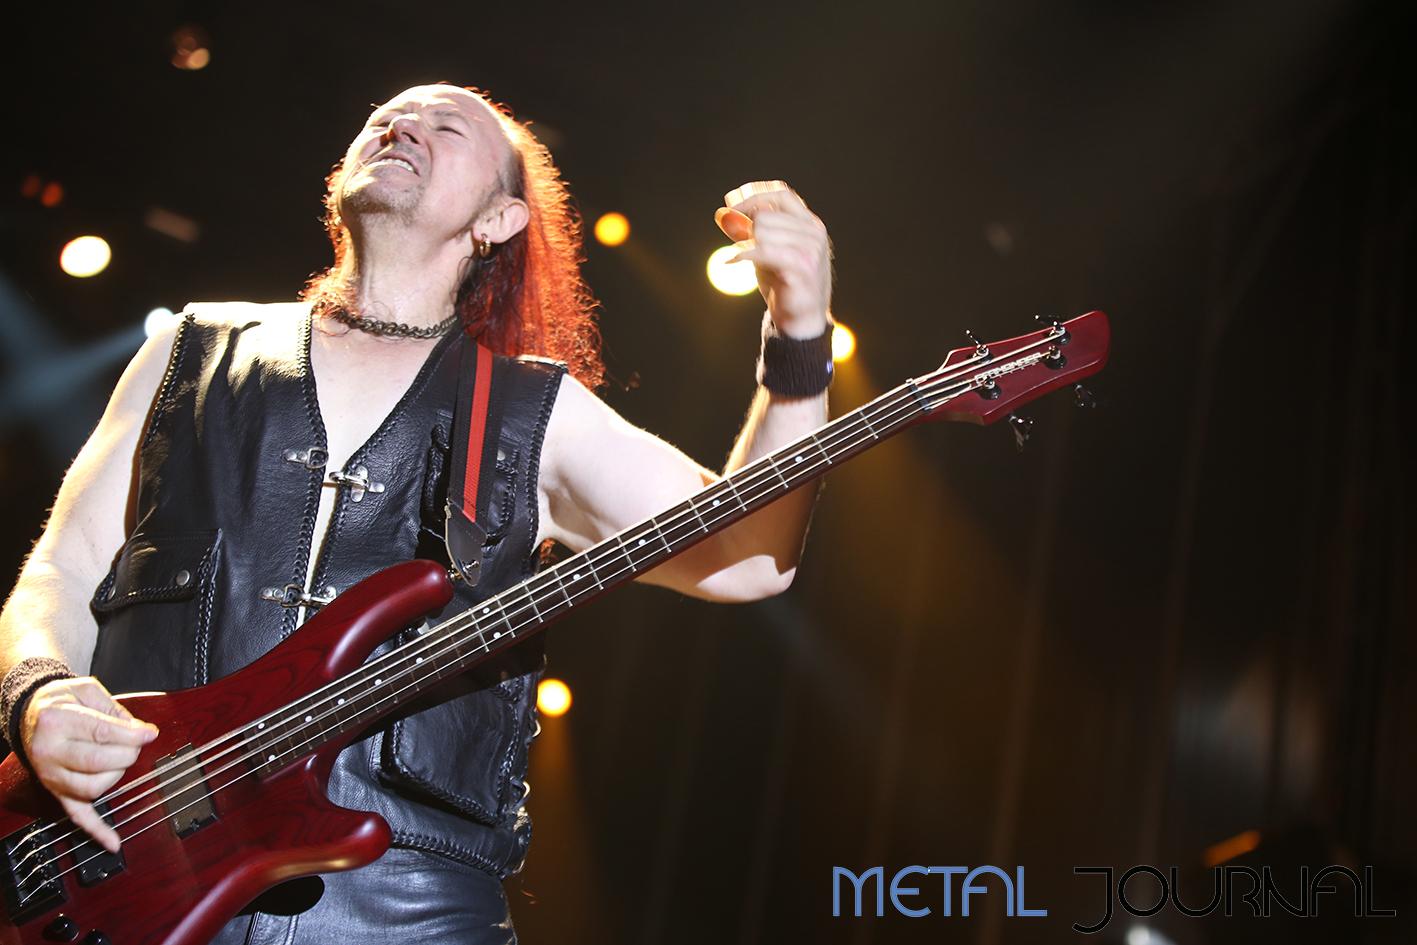 venom - metal journal rock fest barcelona 2019 pic 4